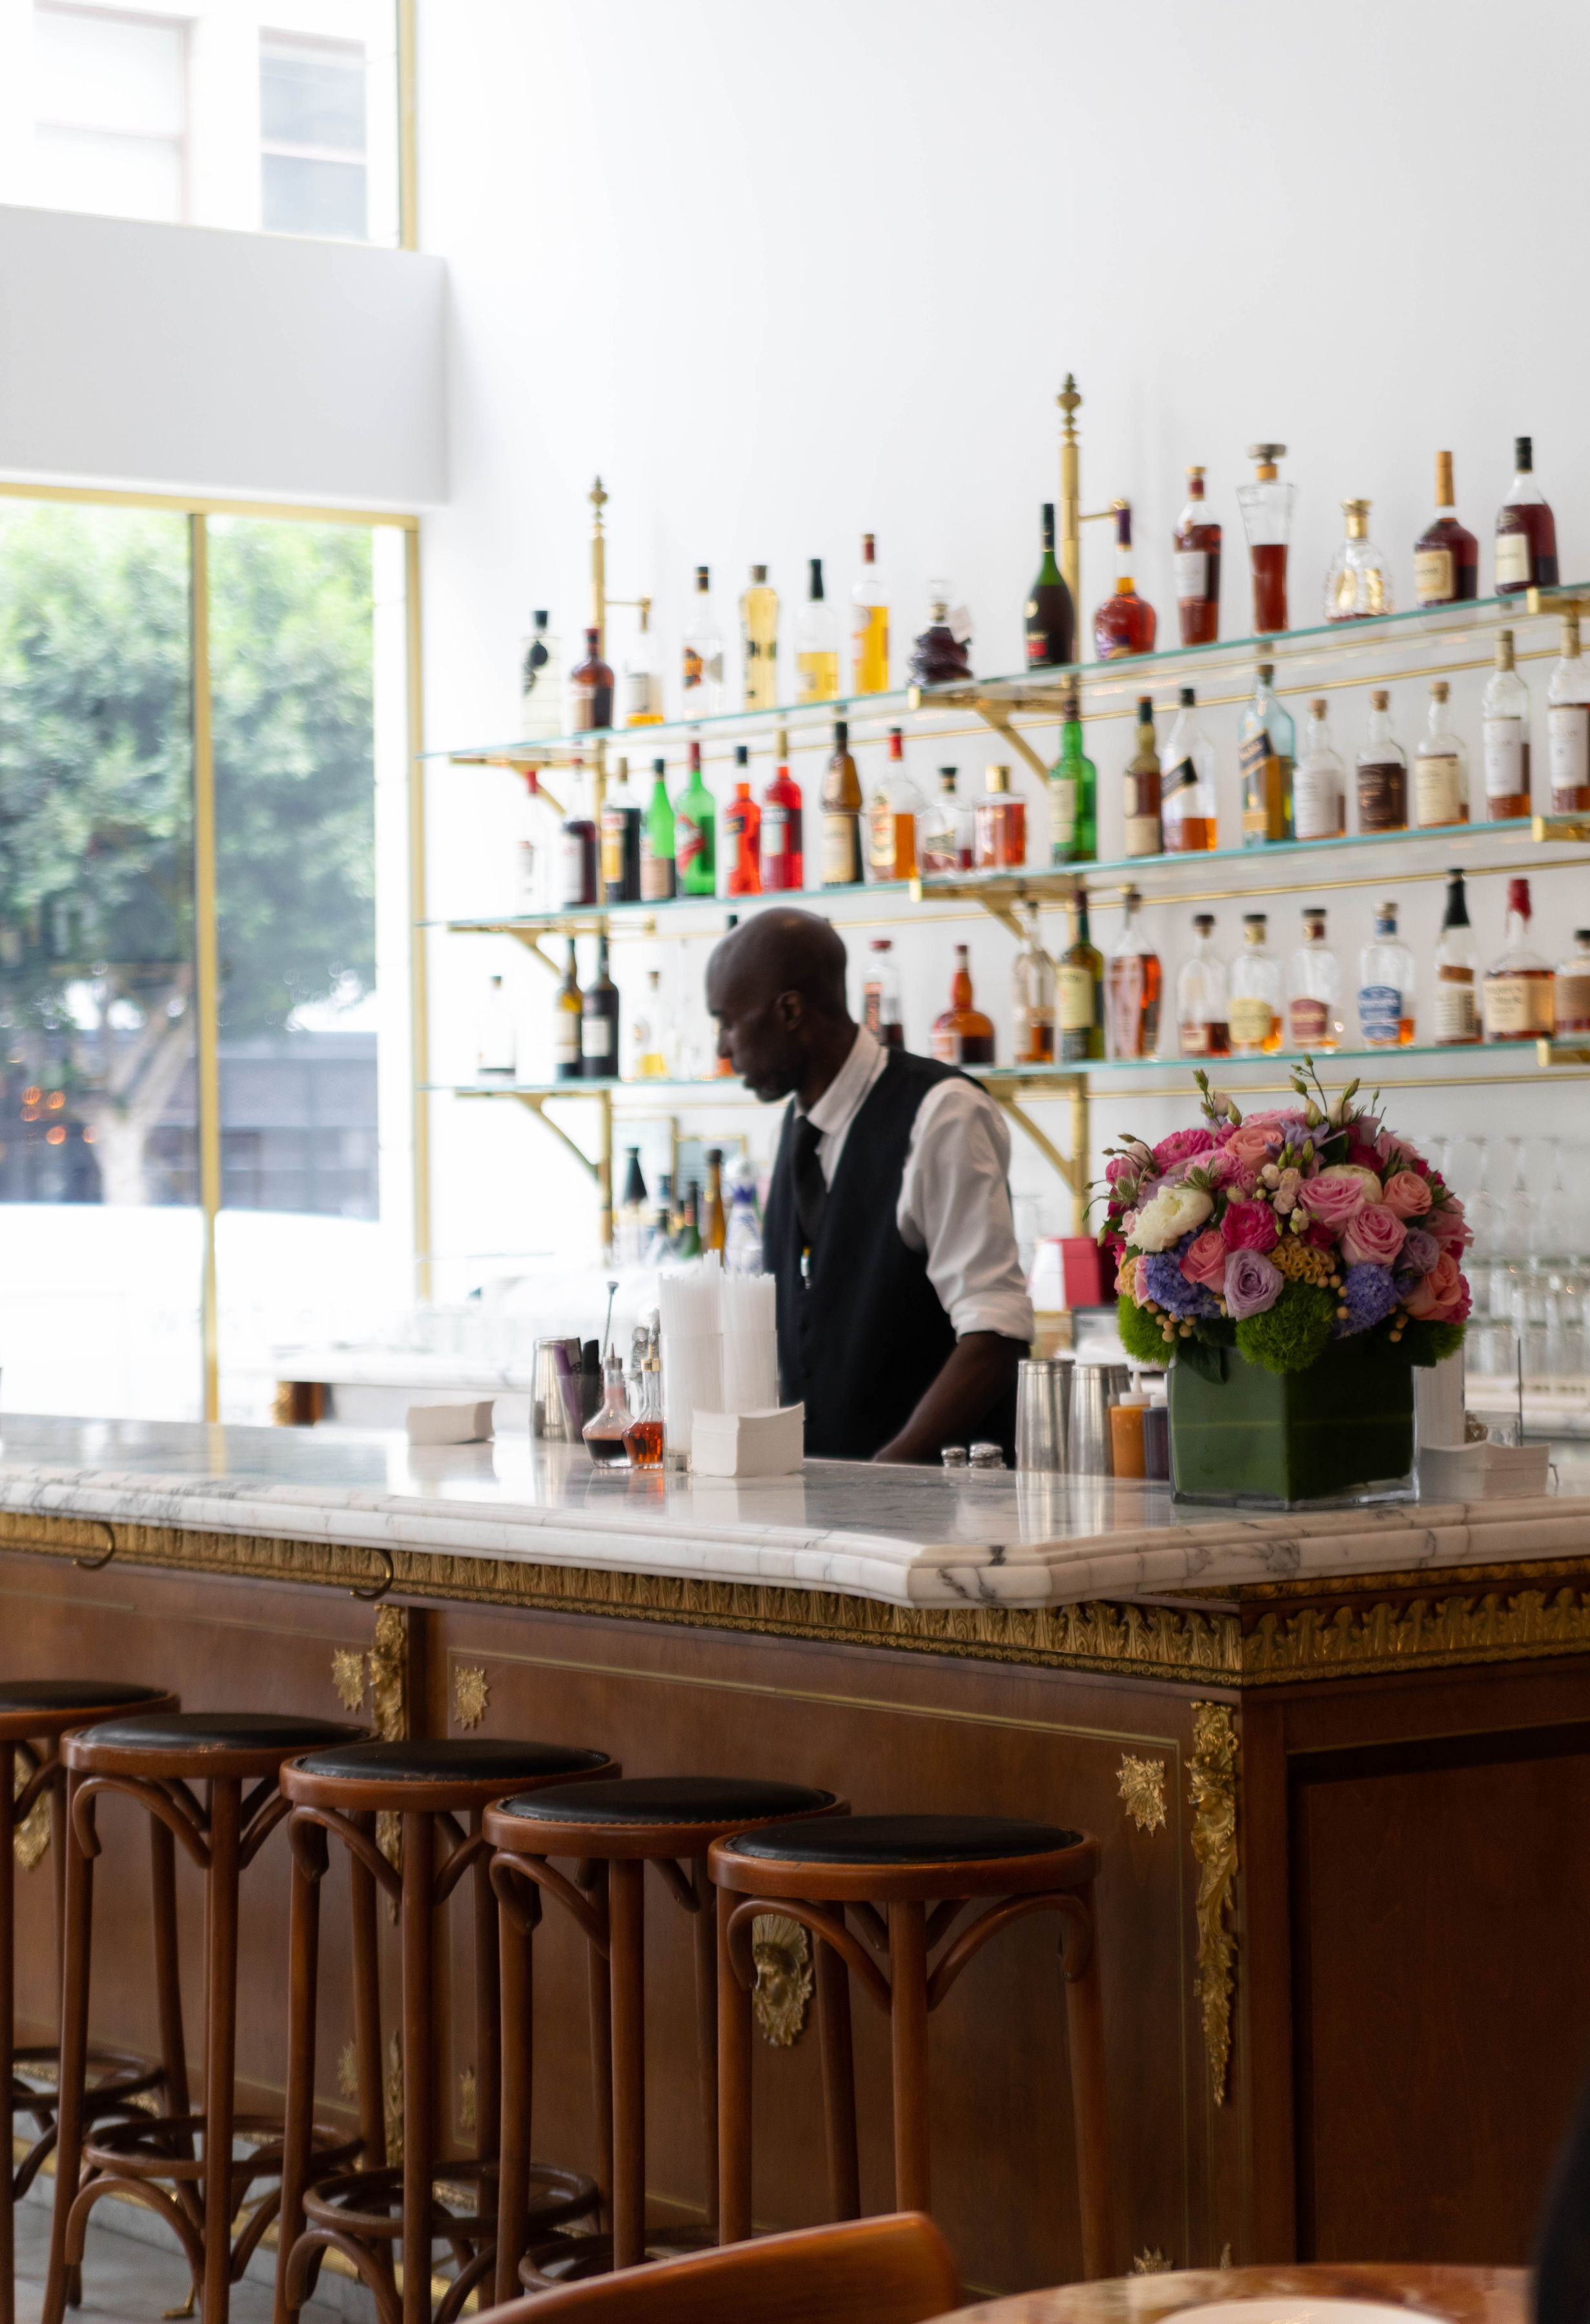 Luxury Restaurants of the World: Bottega Louie Gourmet Market & Pâtisserie in Los Angeles